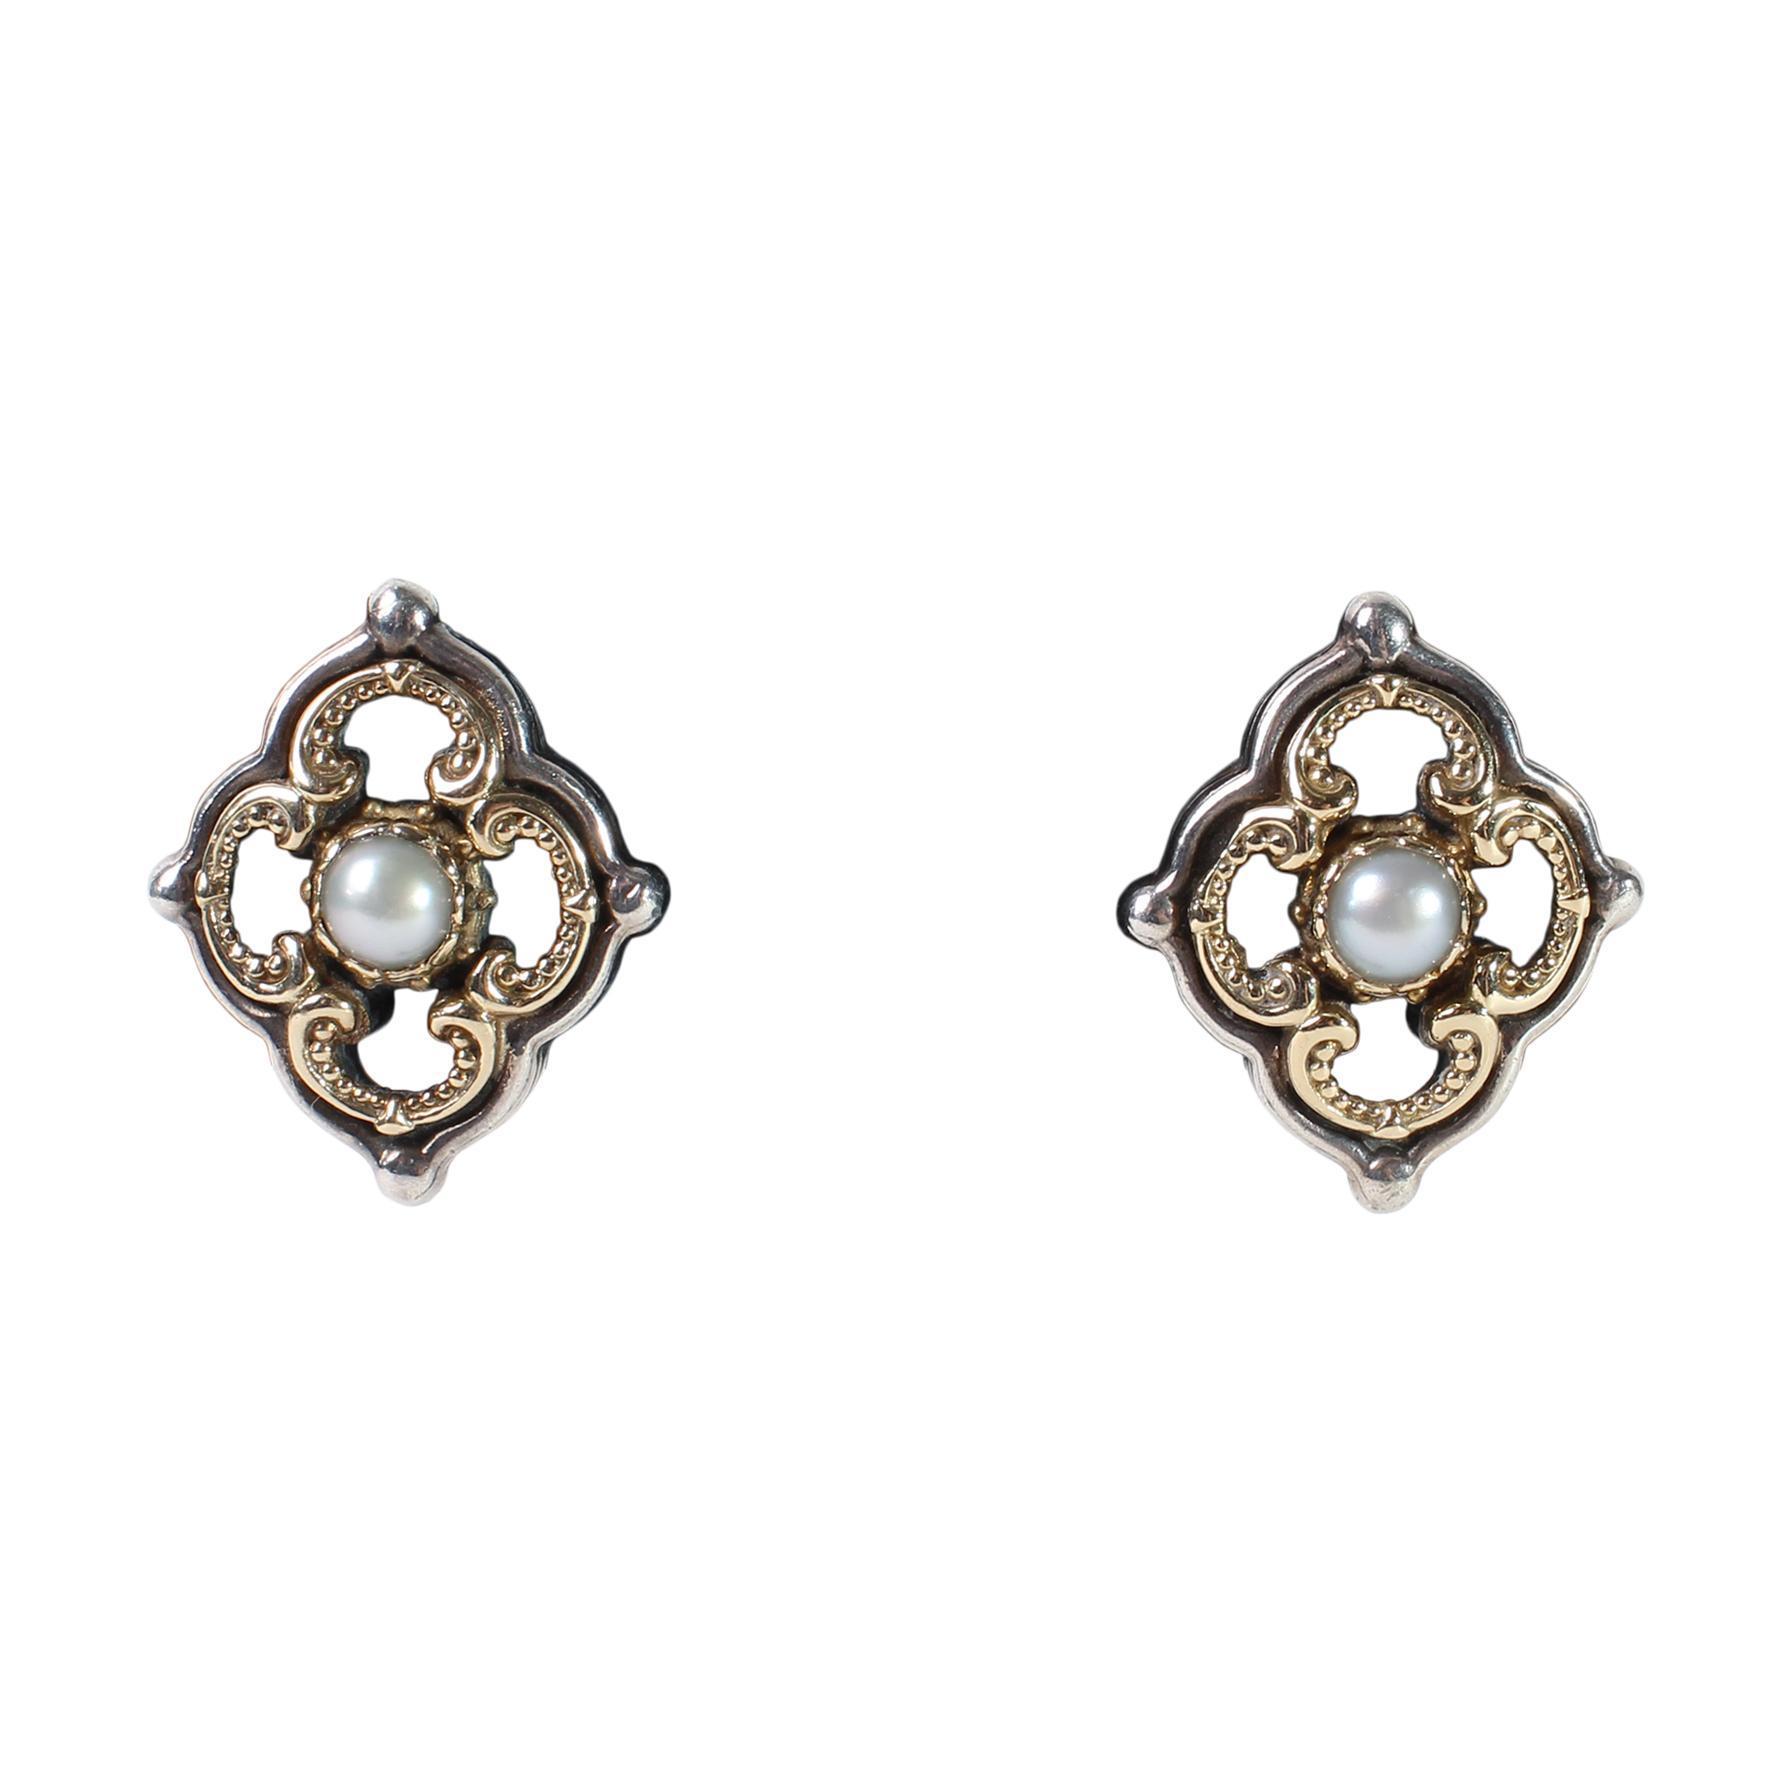 Konstantino 18k Sterling Silver & Pearl Quatrefoil Earrings